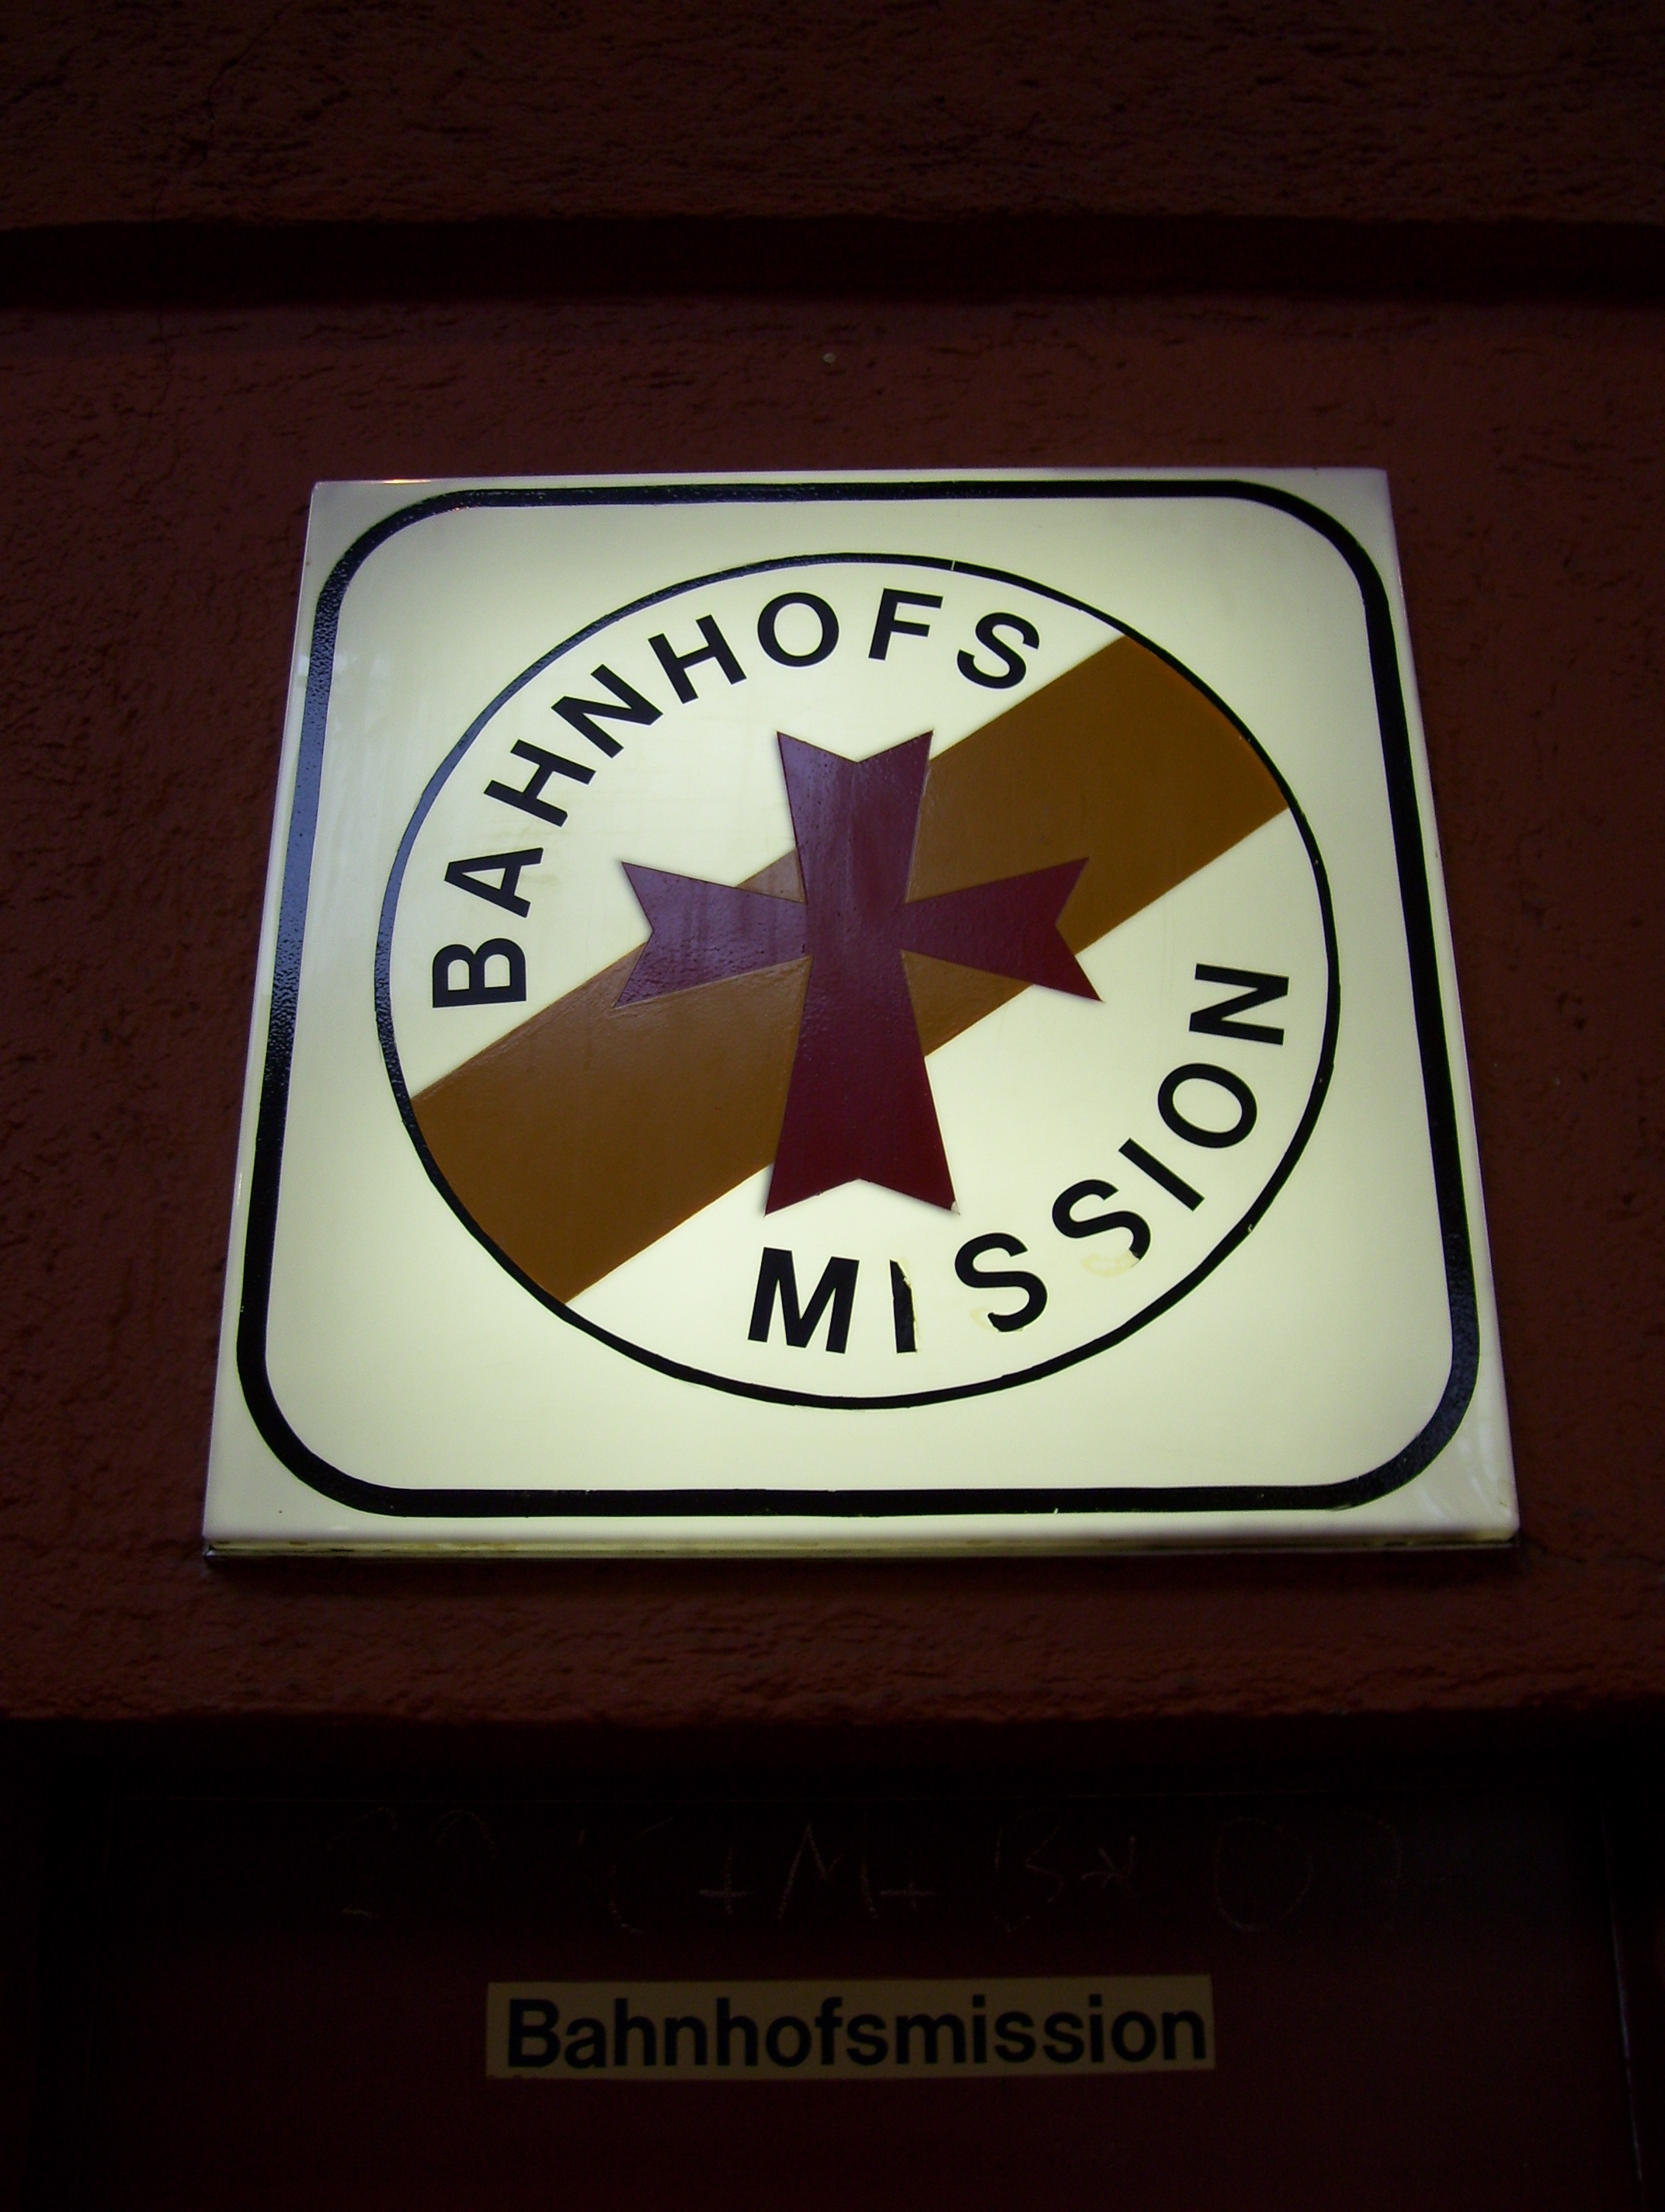 Bahnhofsmission